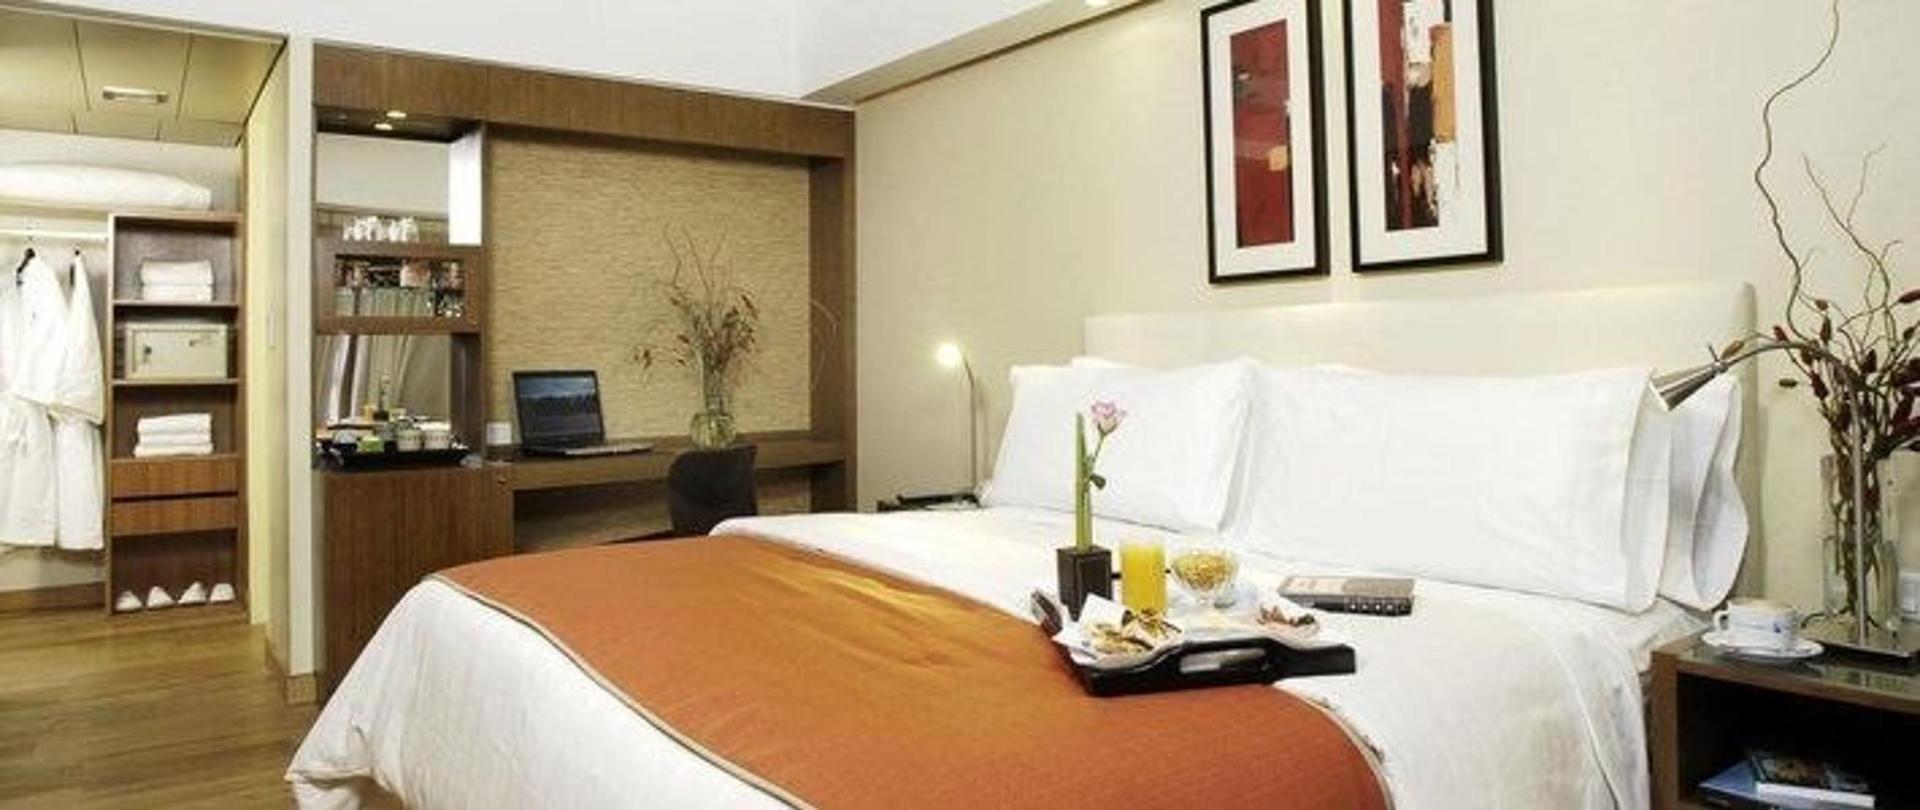 1-home_regente-palace-hotel.jpg